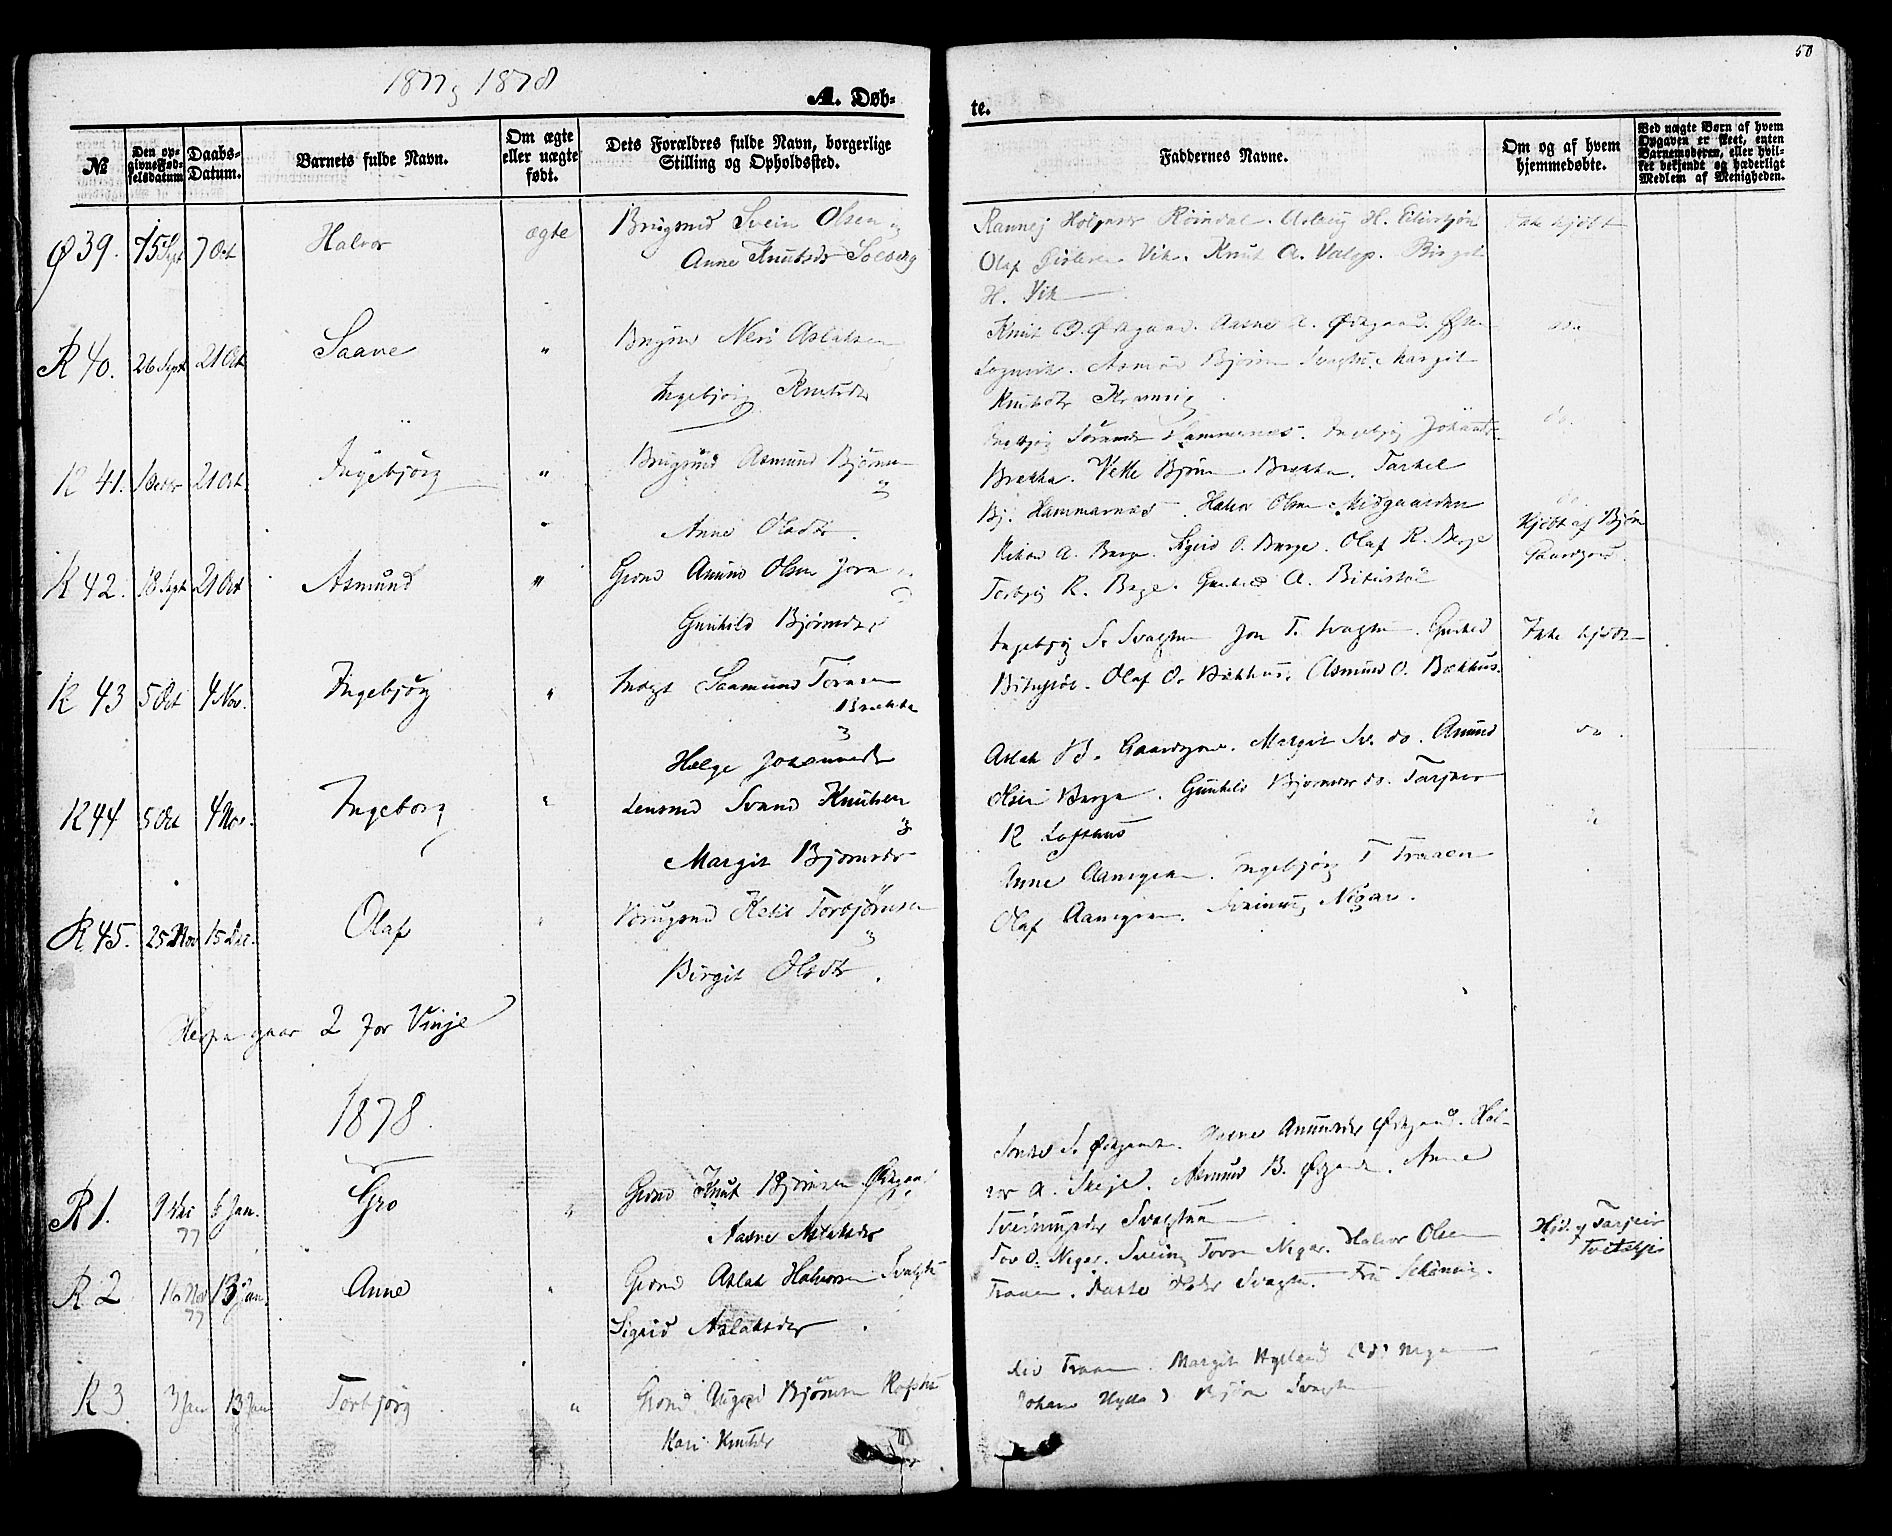 SAKO, Rauland kirkebøker, F/Fa/L0003: Ministerialbok nr. 3, 1859-1886, s. 50